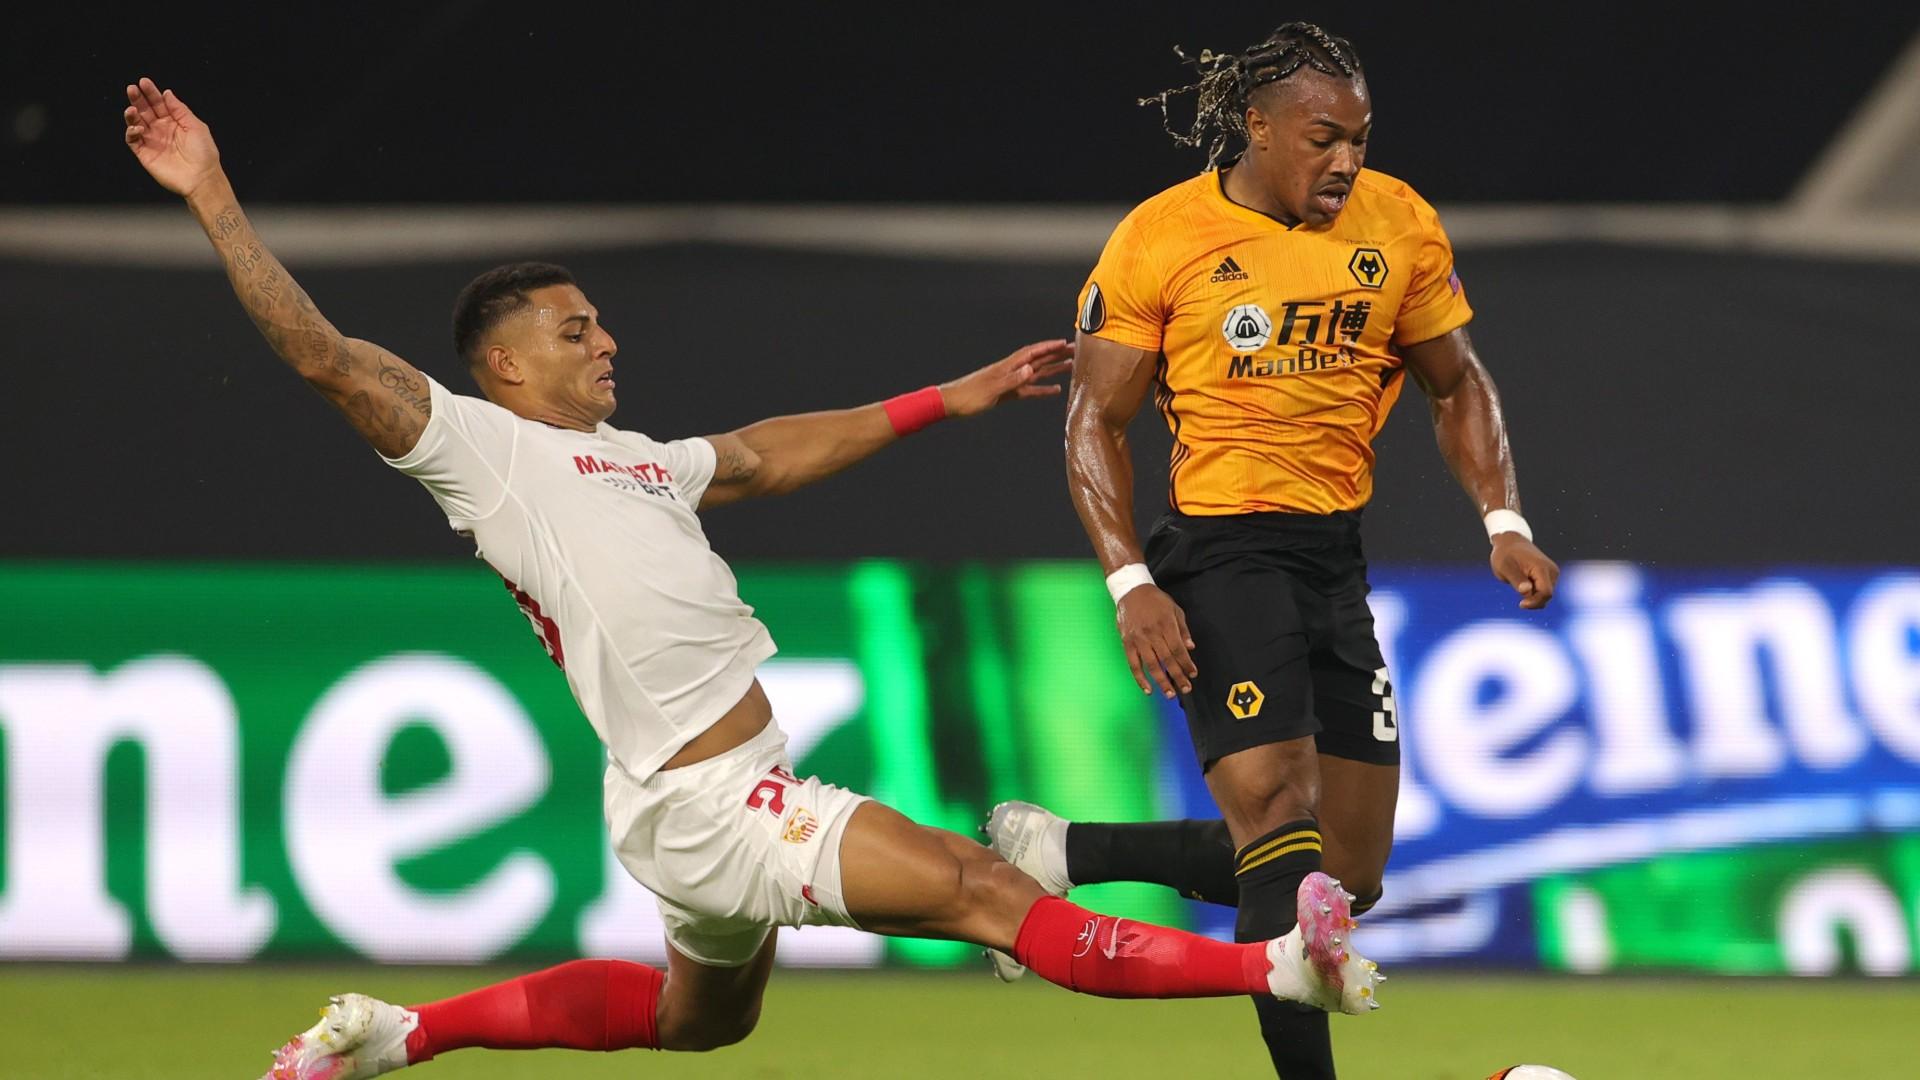 LIVE: Wolves vs Sevilla